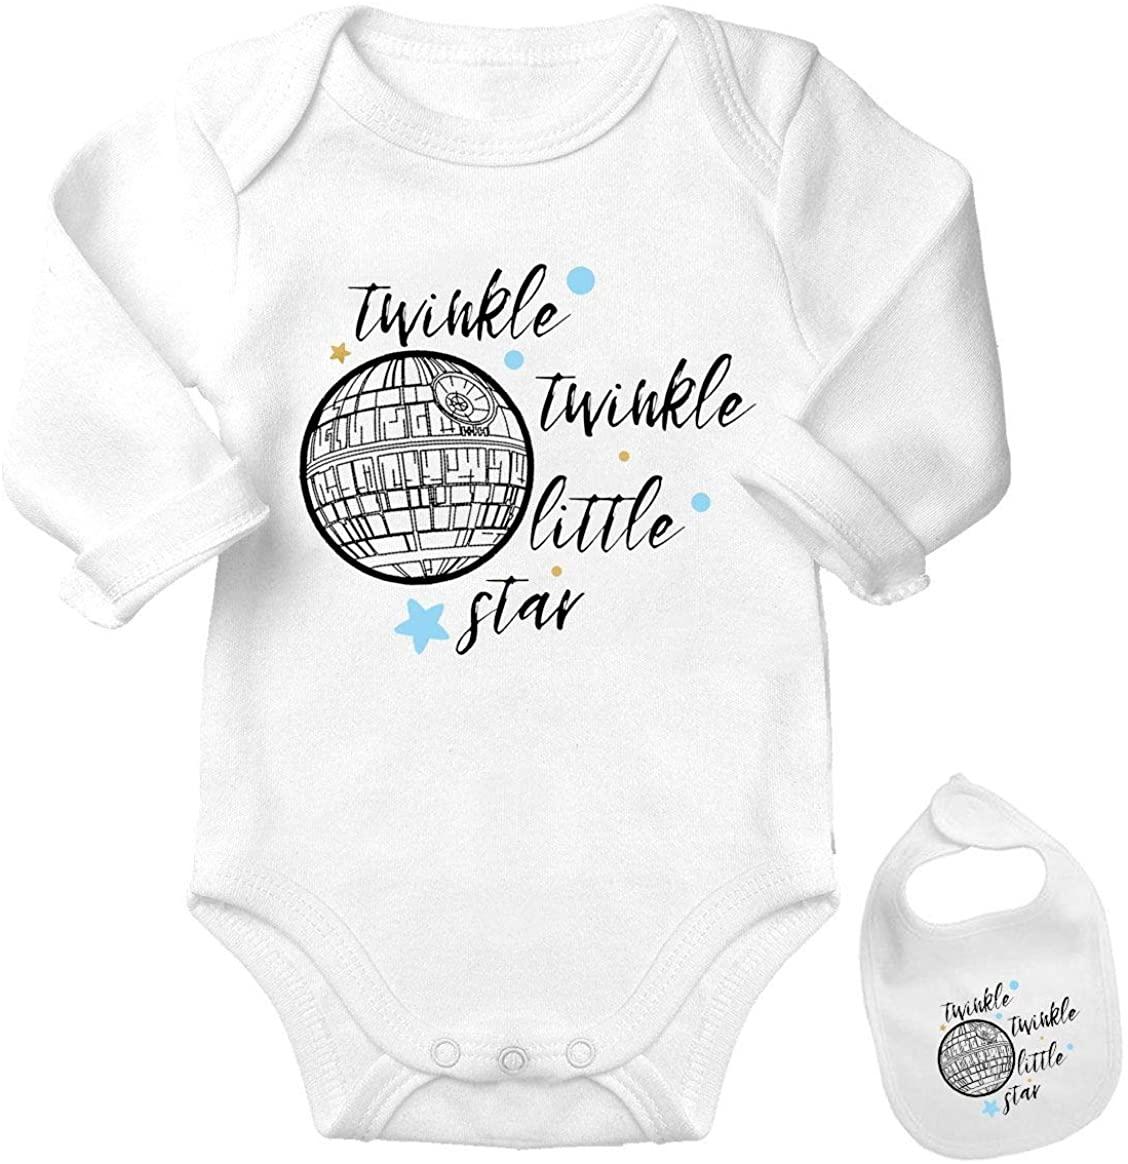 Death Star -Cute Starwars Funny Shirt Newborn Baby Bodysuit Outfit Onesie & Bib